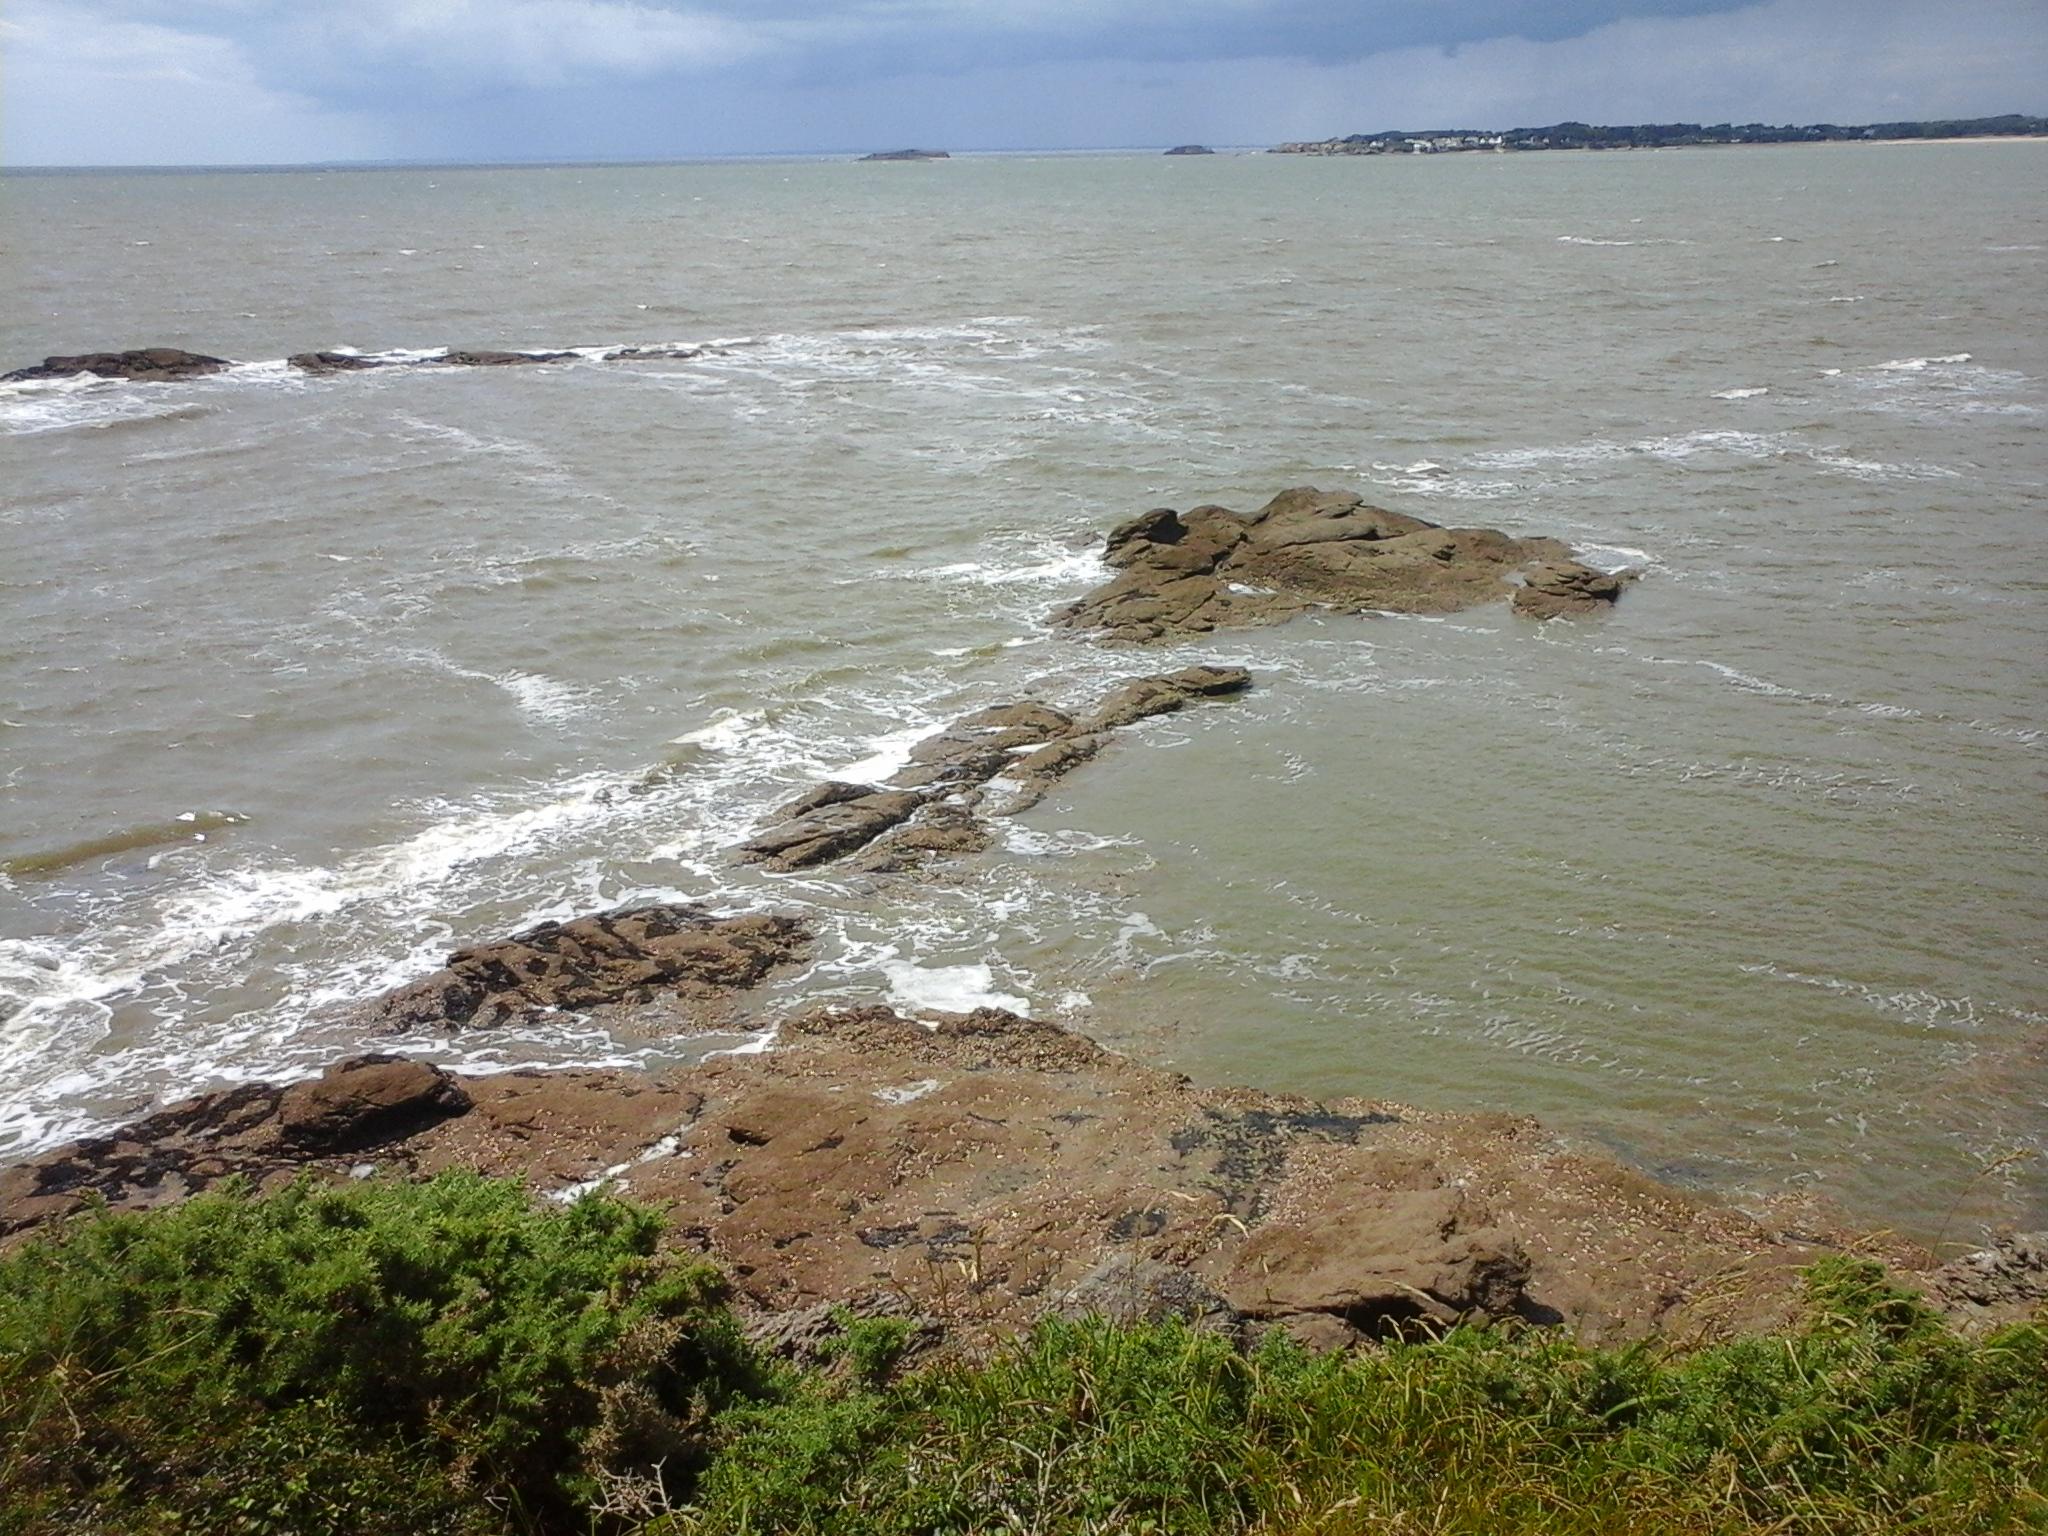 L'océan à 5 mn à peine :)